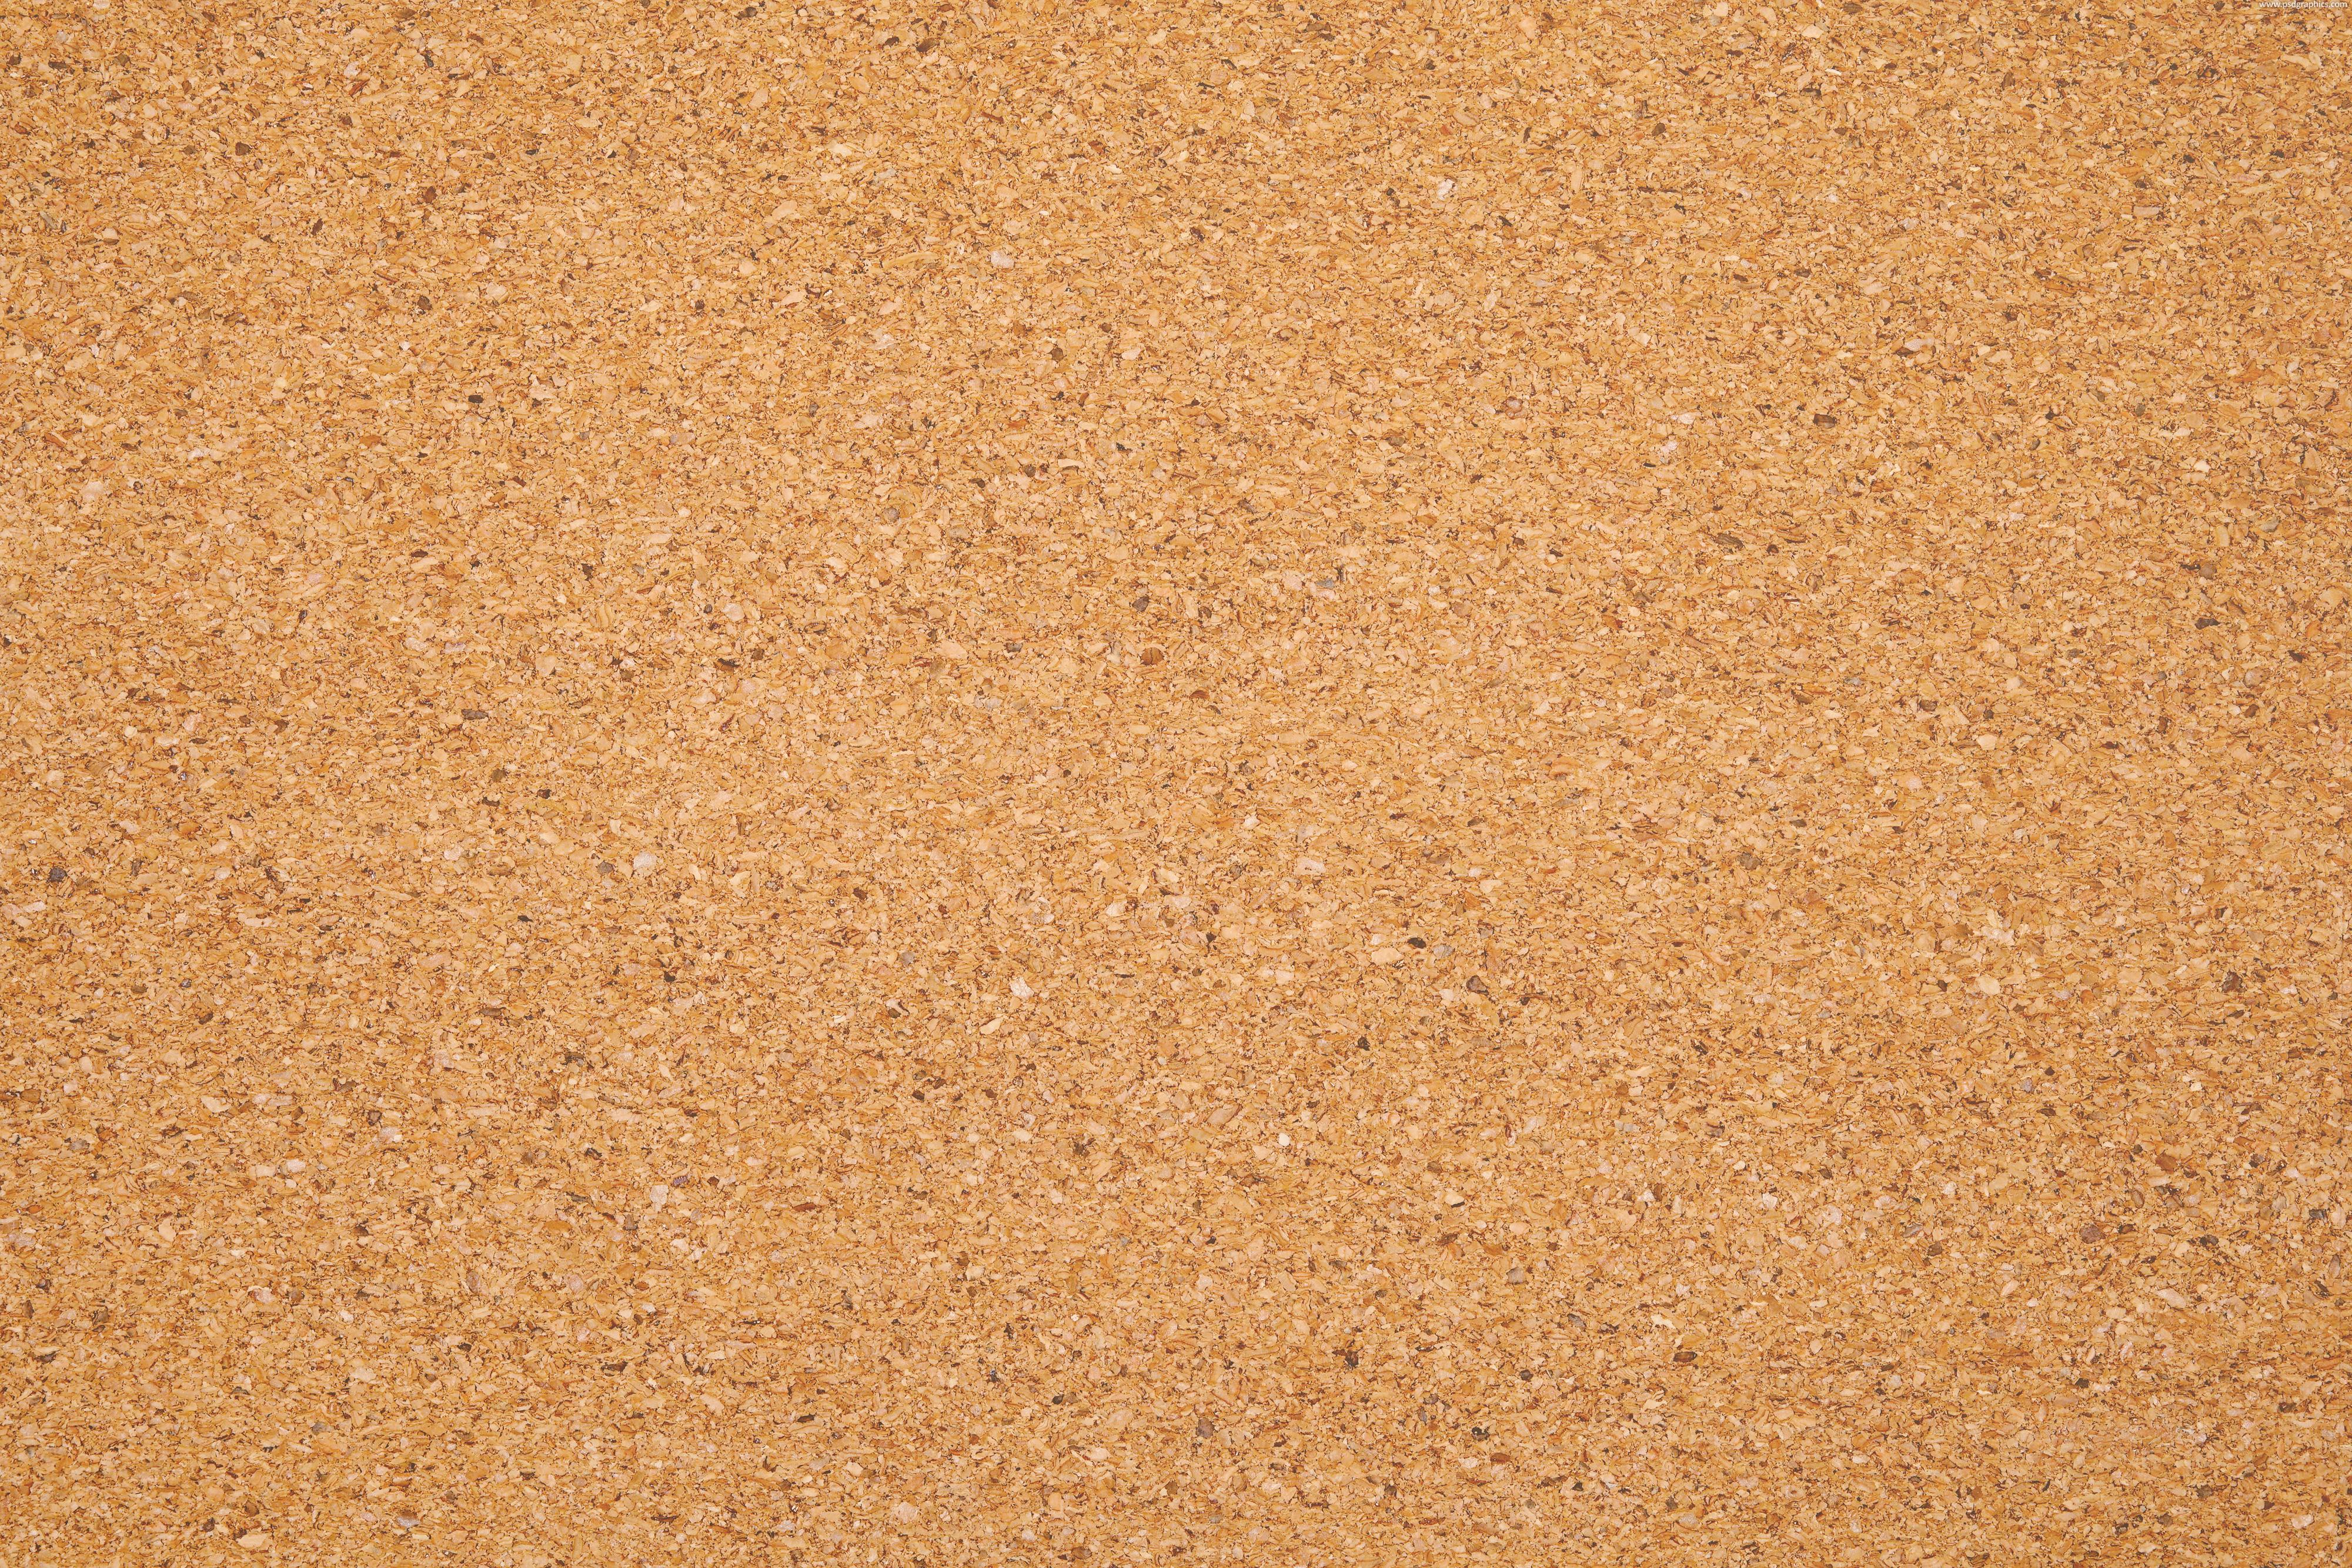 Blank cork background | PSDGraphics